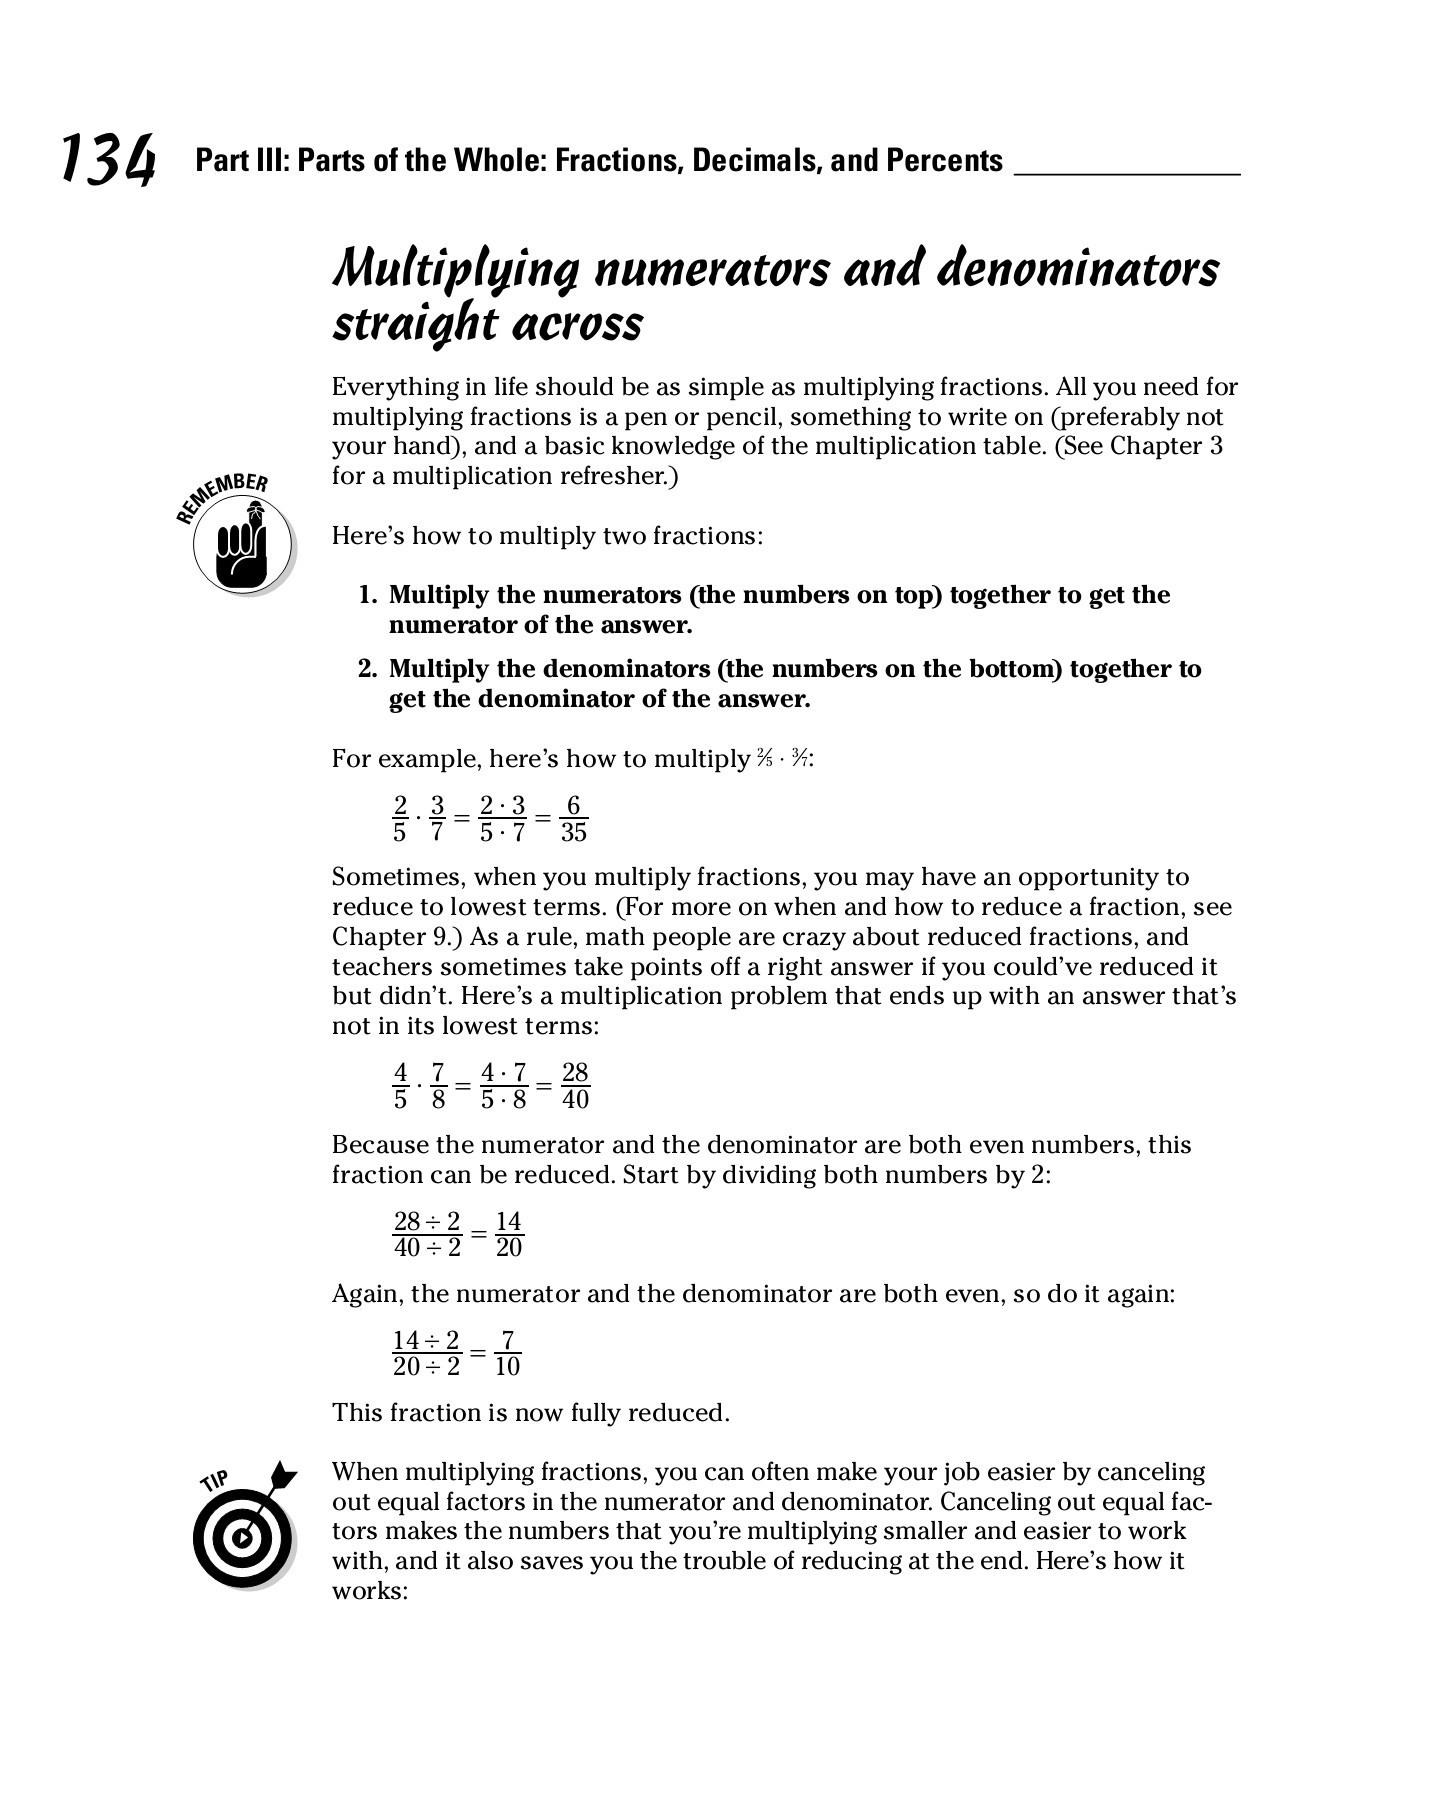 Worksheet Free Stuff For Teachers Good Manners Worksheets